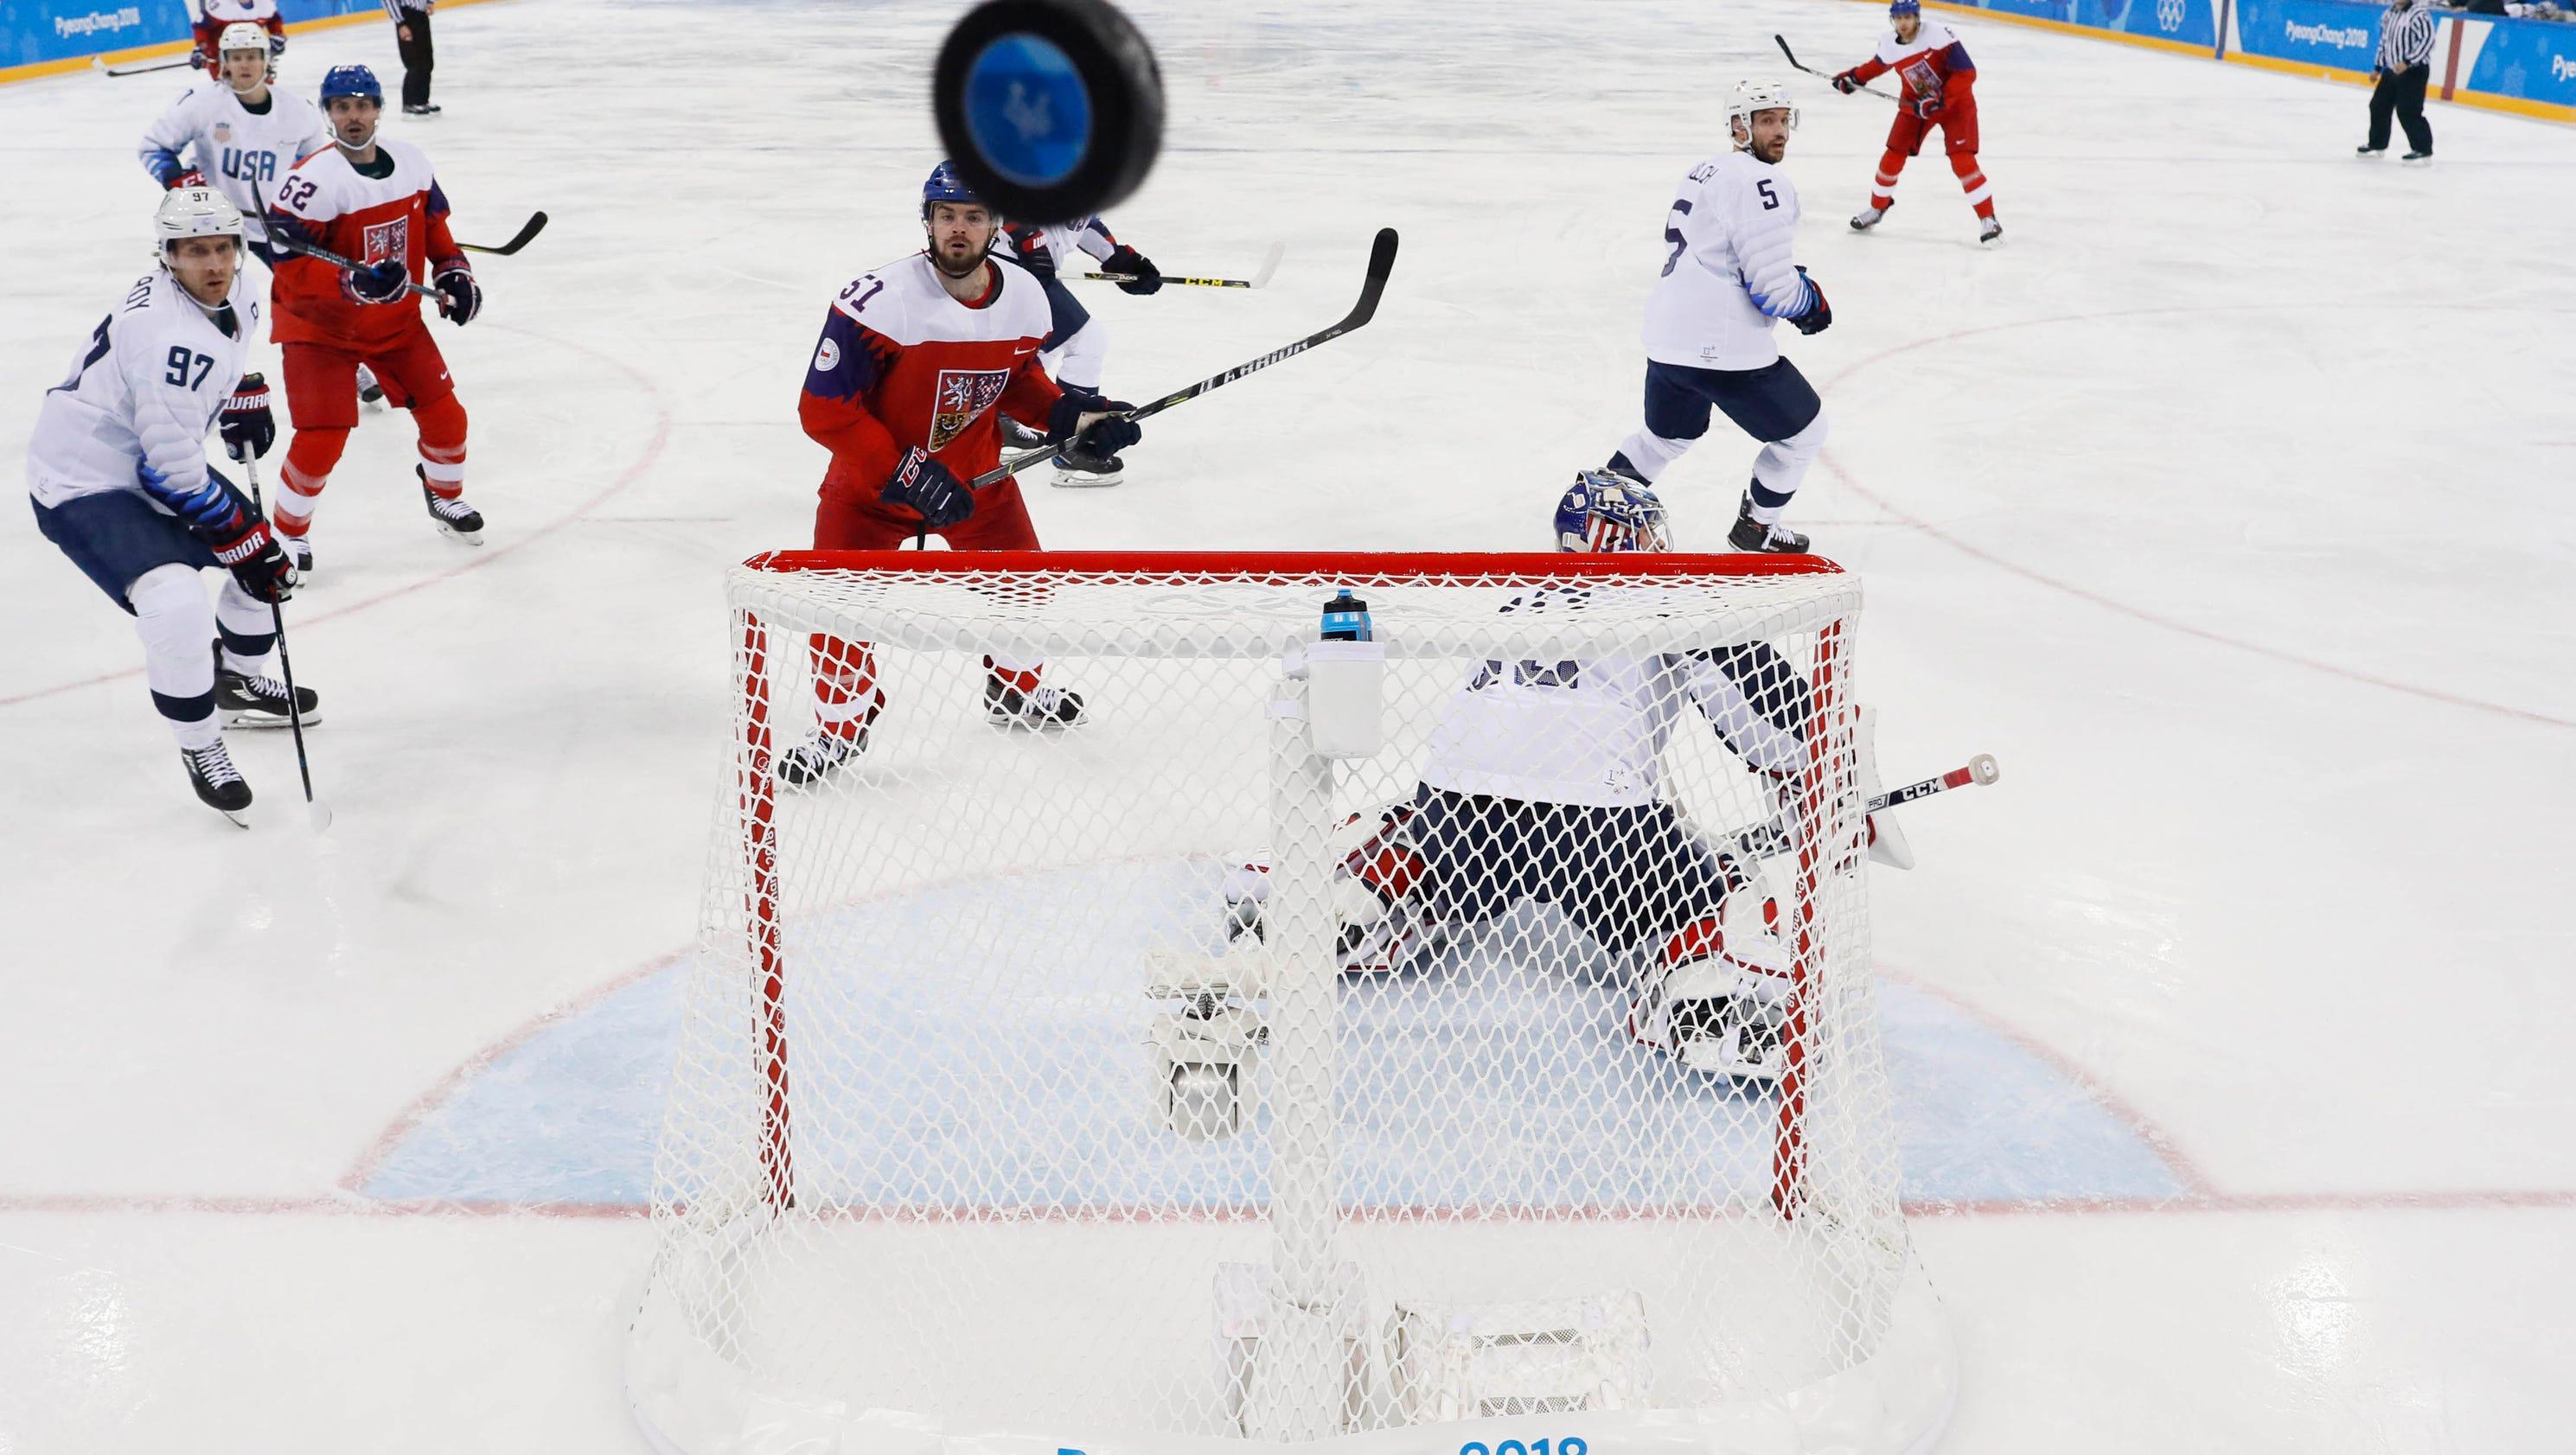 636547670825073708-usp-olympics-ice-hockey-men-team-quarterfinal---u-97756415